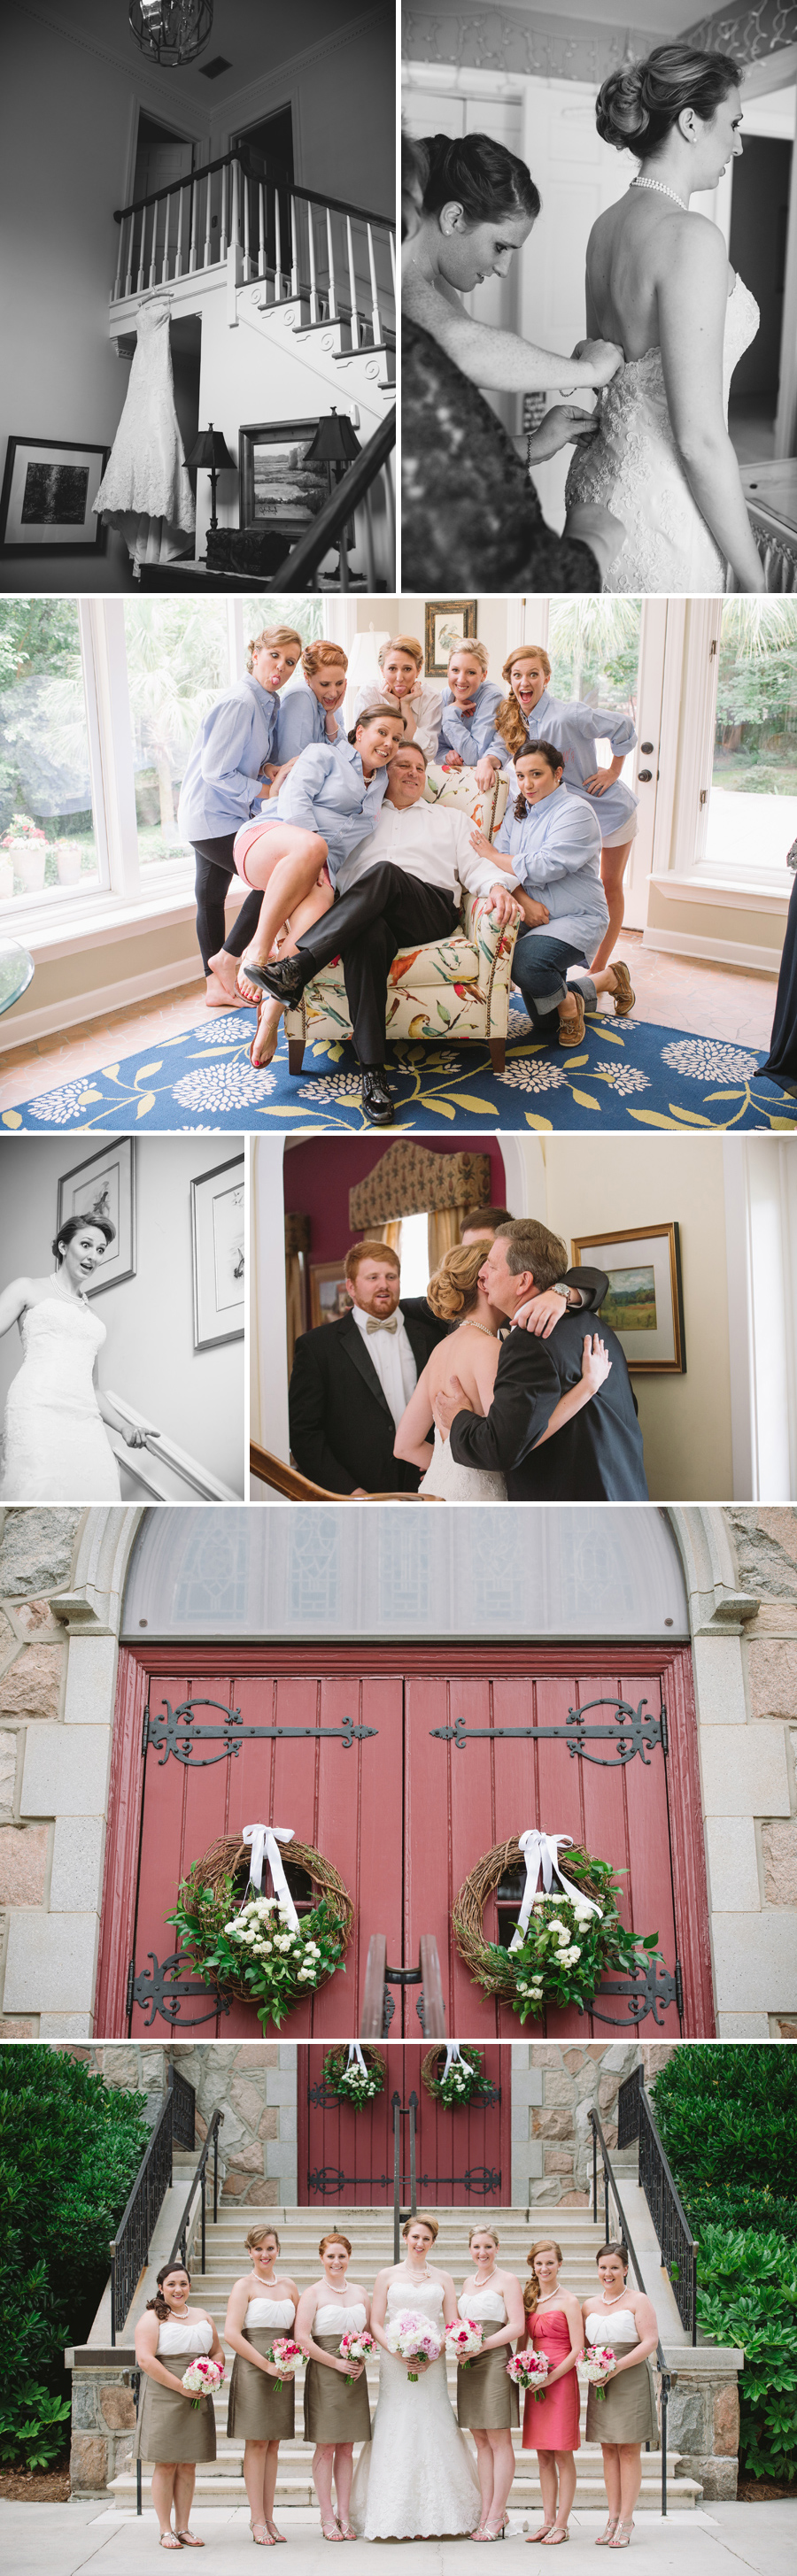 hollis-james-wedding-museum-art